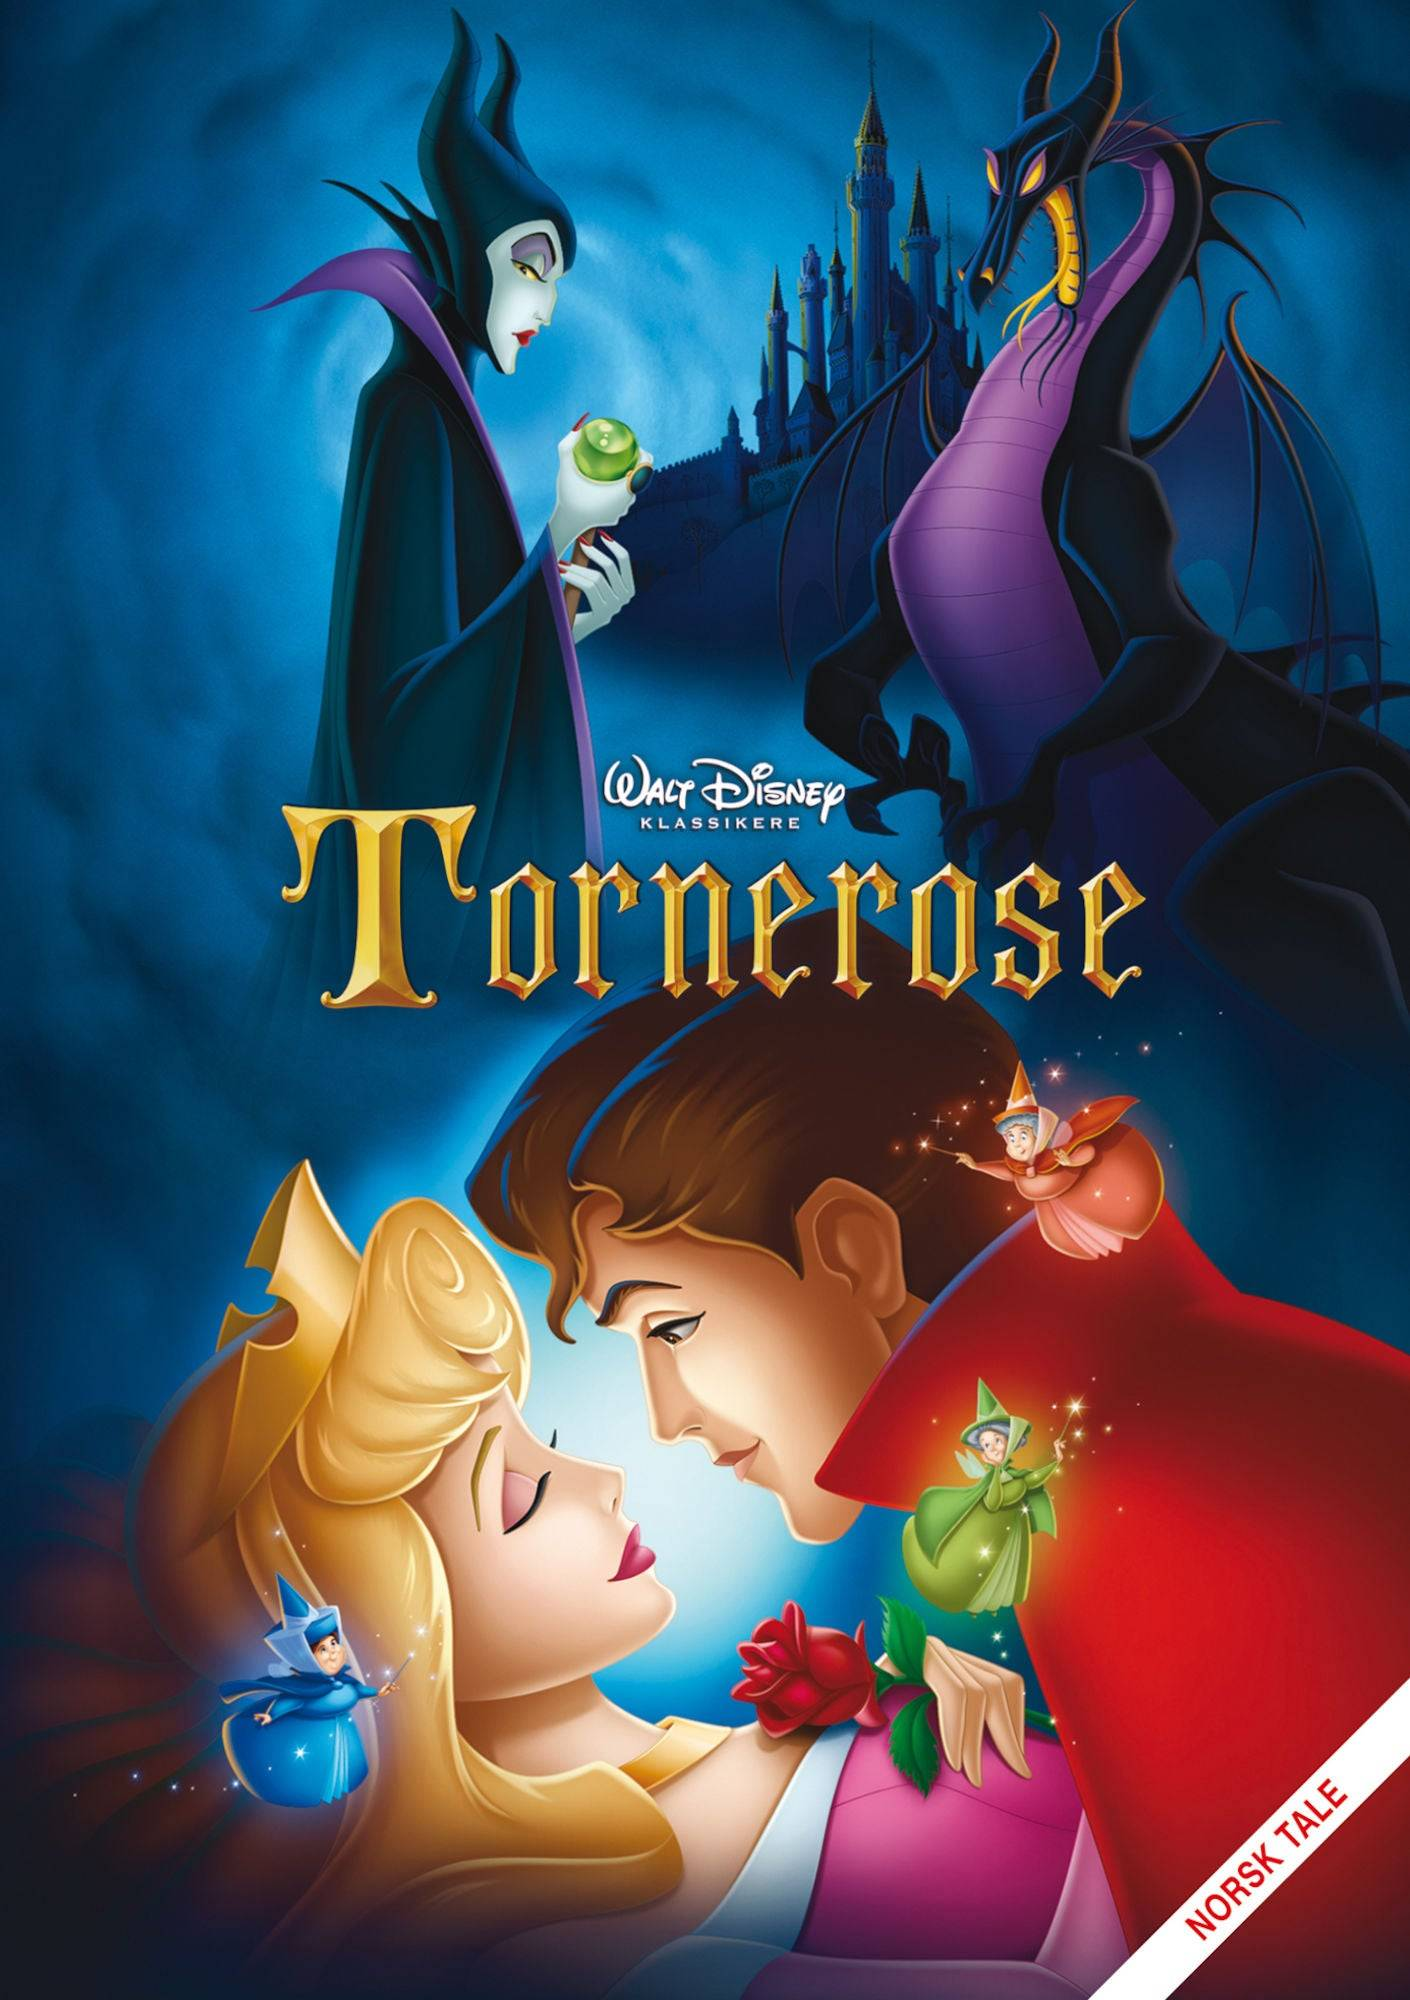 Disney Tornerose DVD